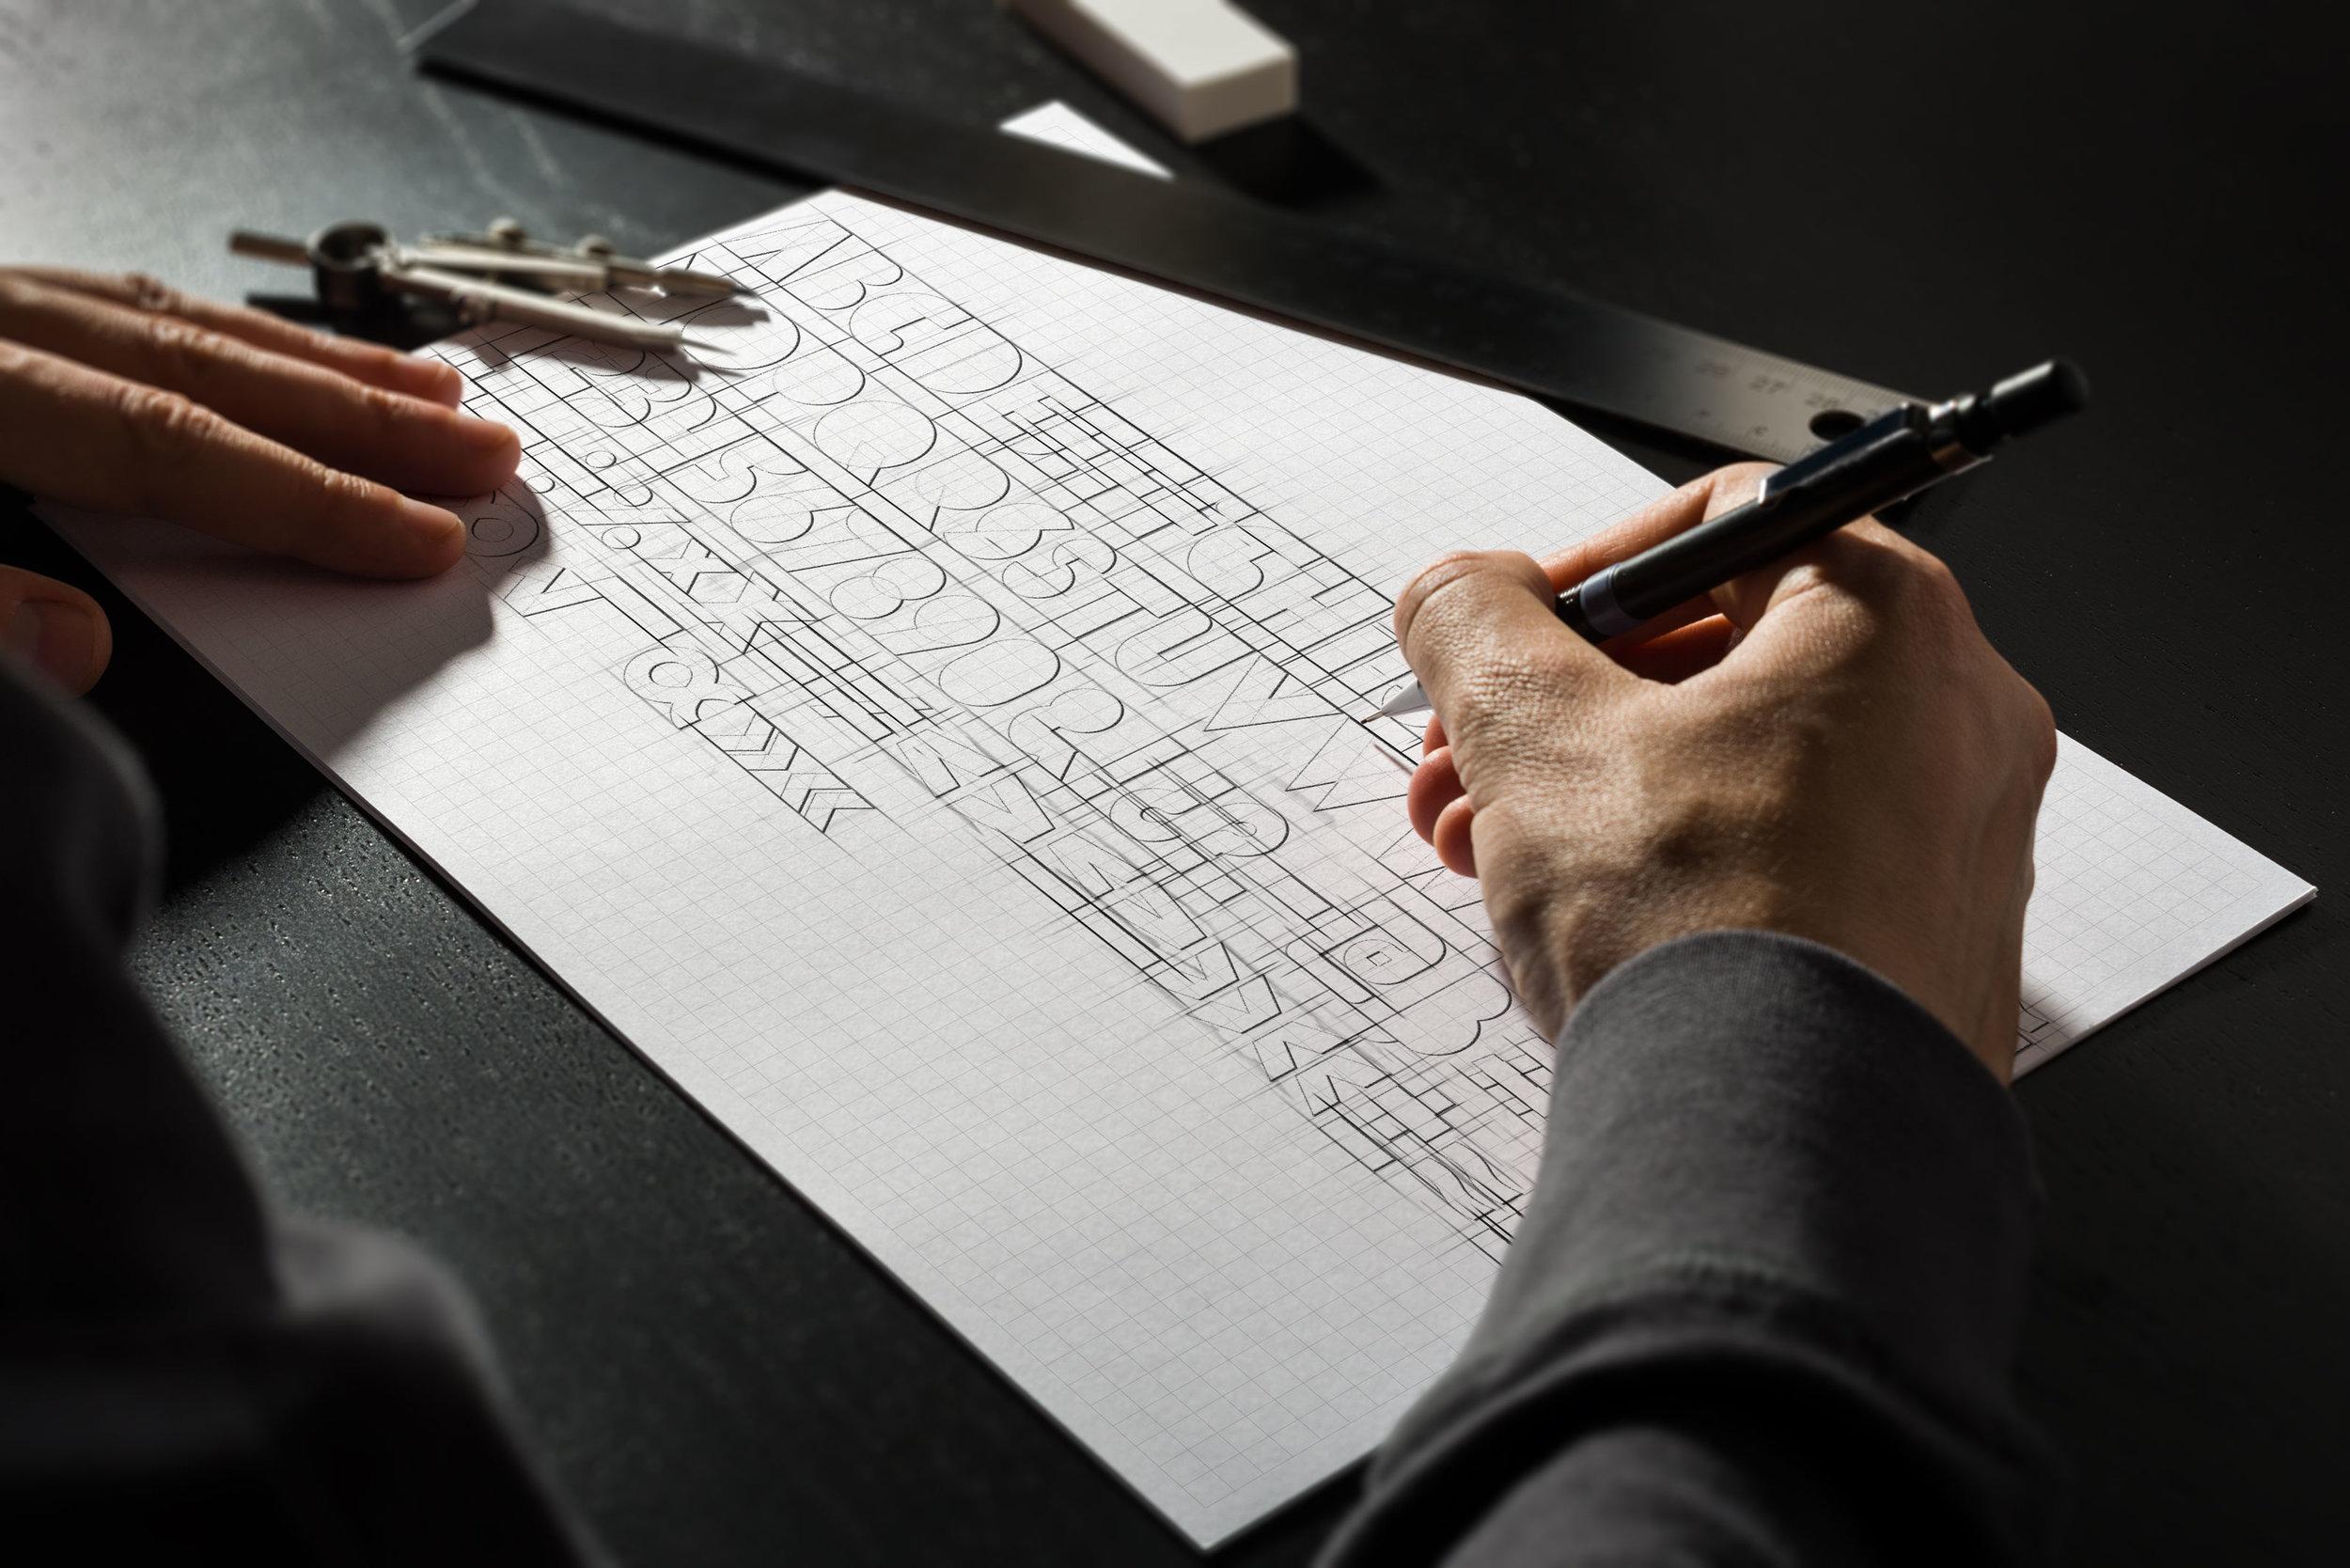 ABL_Port_Typography_Sketch.jpg